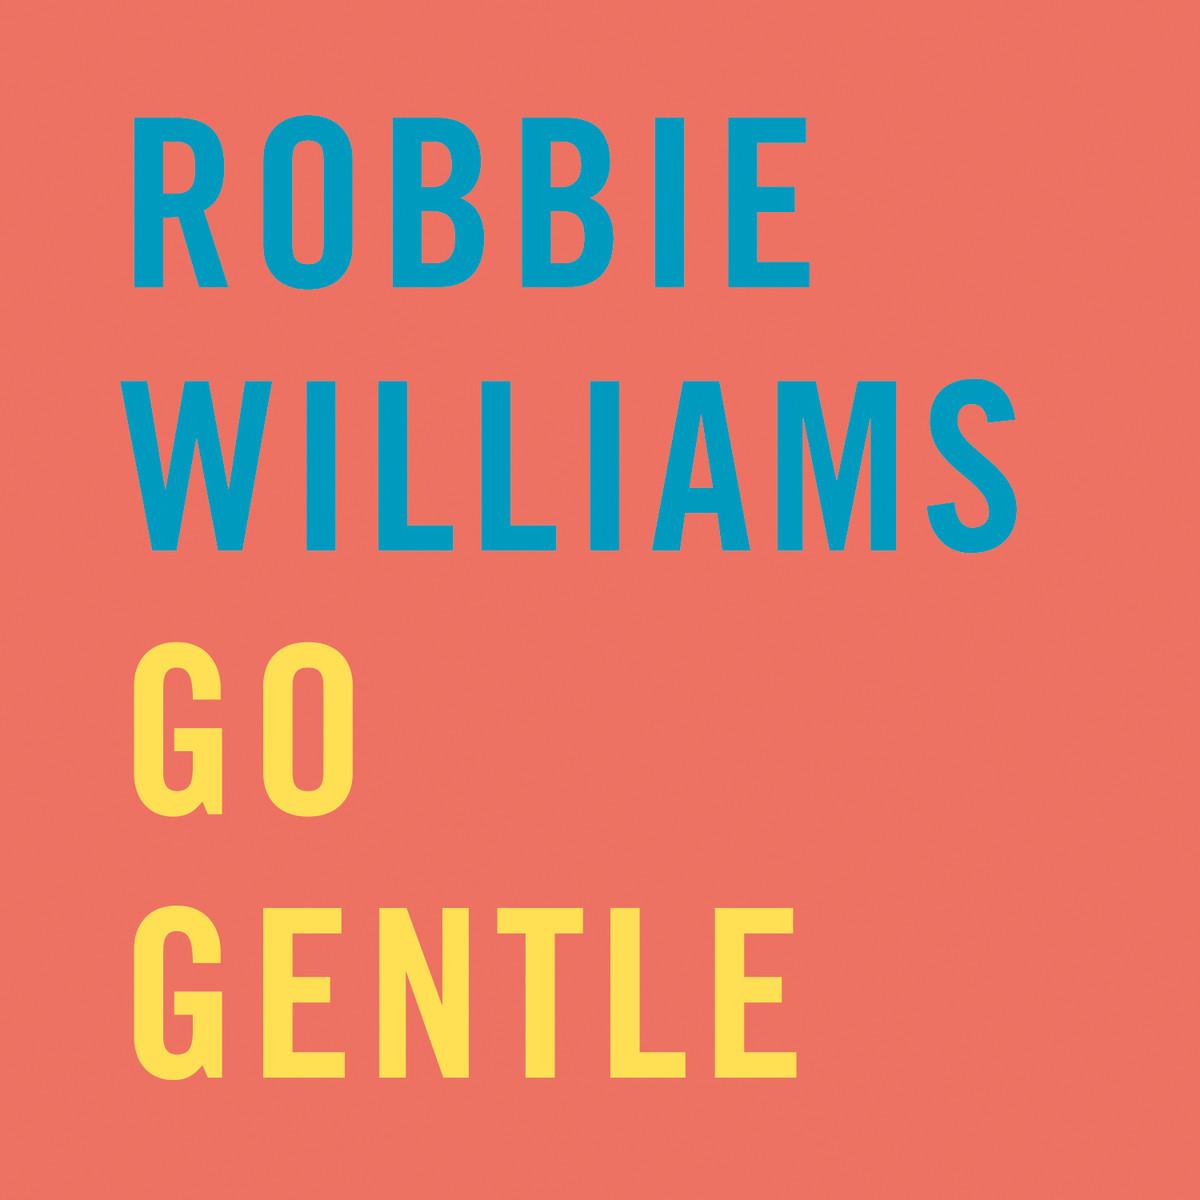 Robbie-Williams-Go-Gentle-2013-1200x1200.png